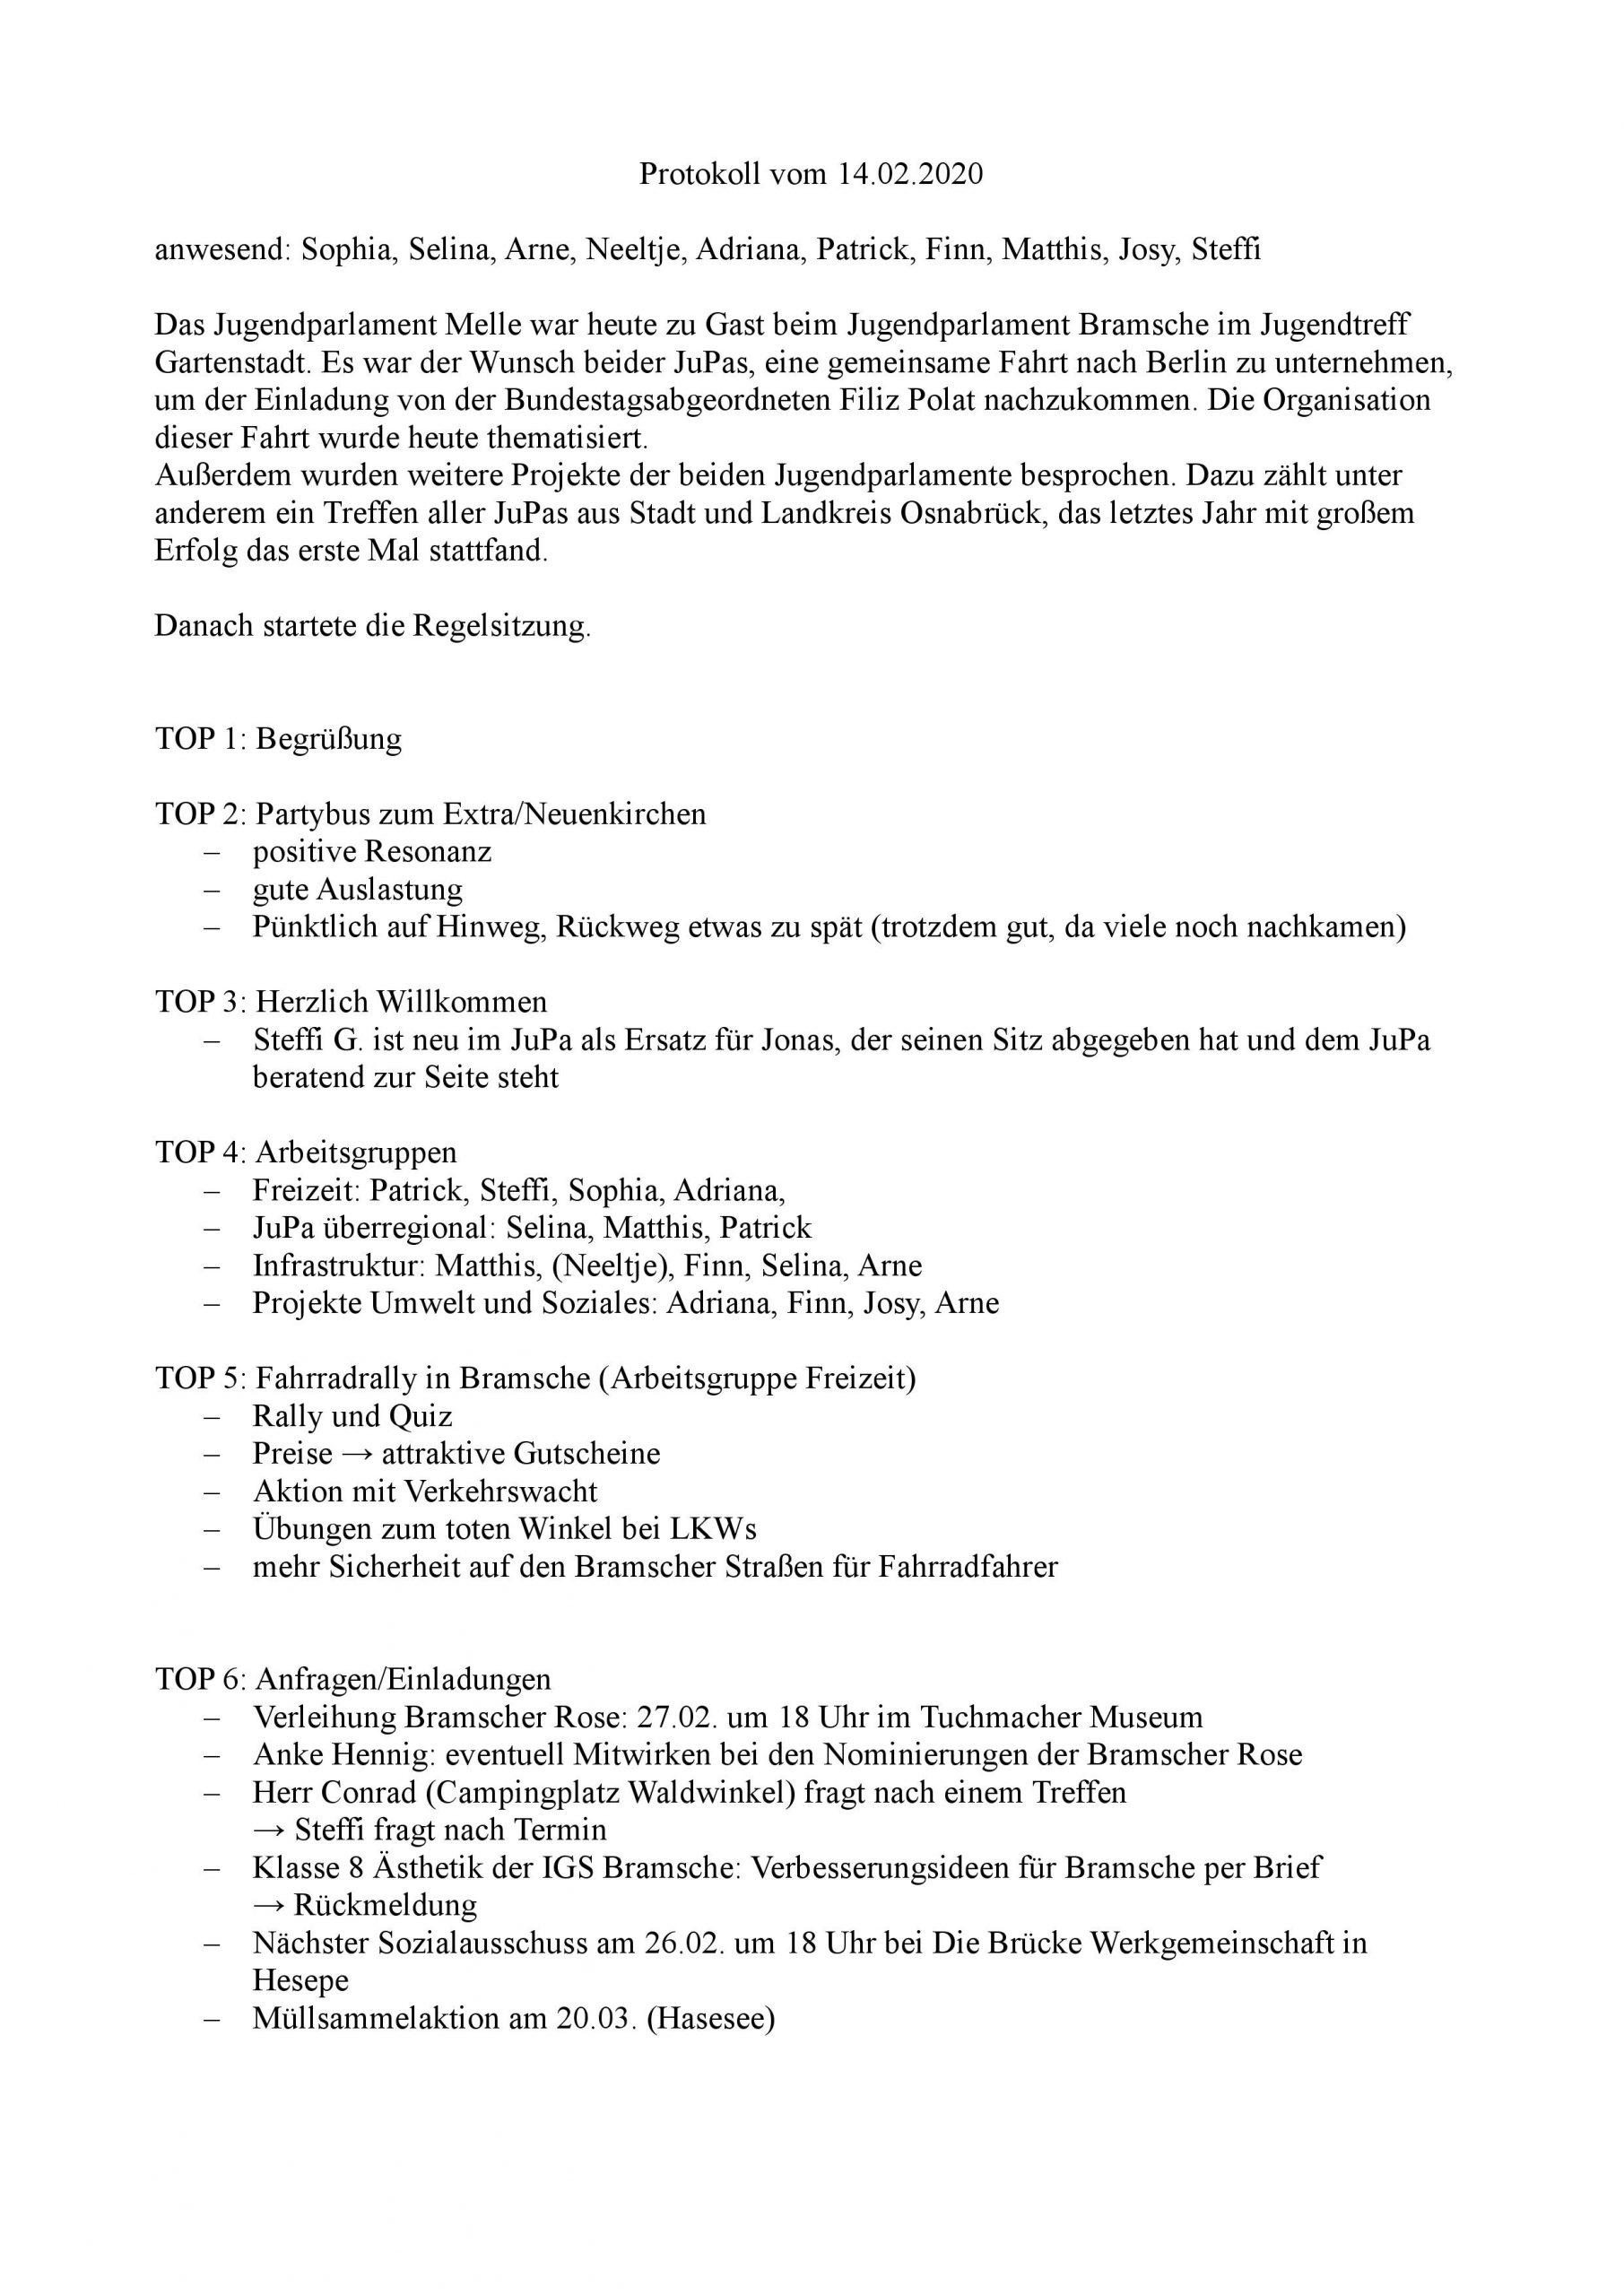 Jupa Protokoll Febr. 2020 Bramsche